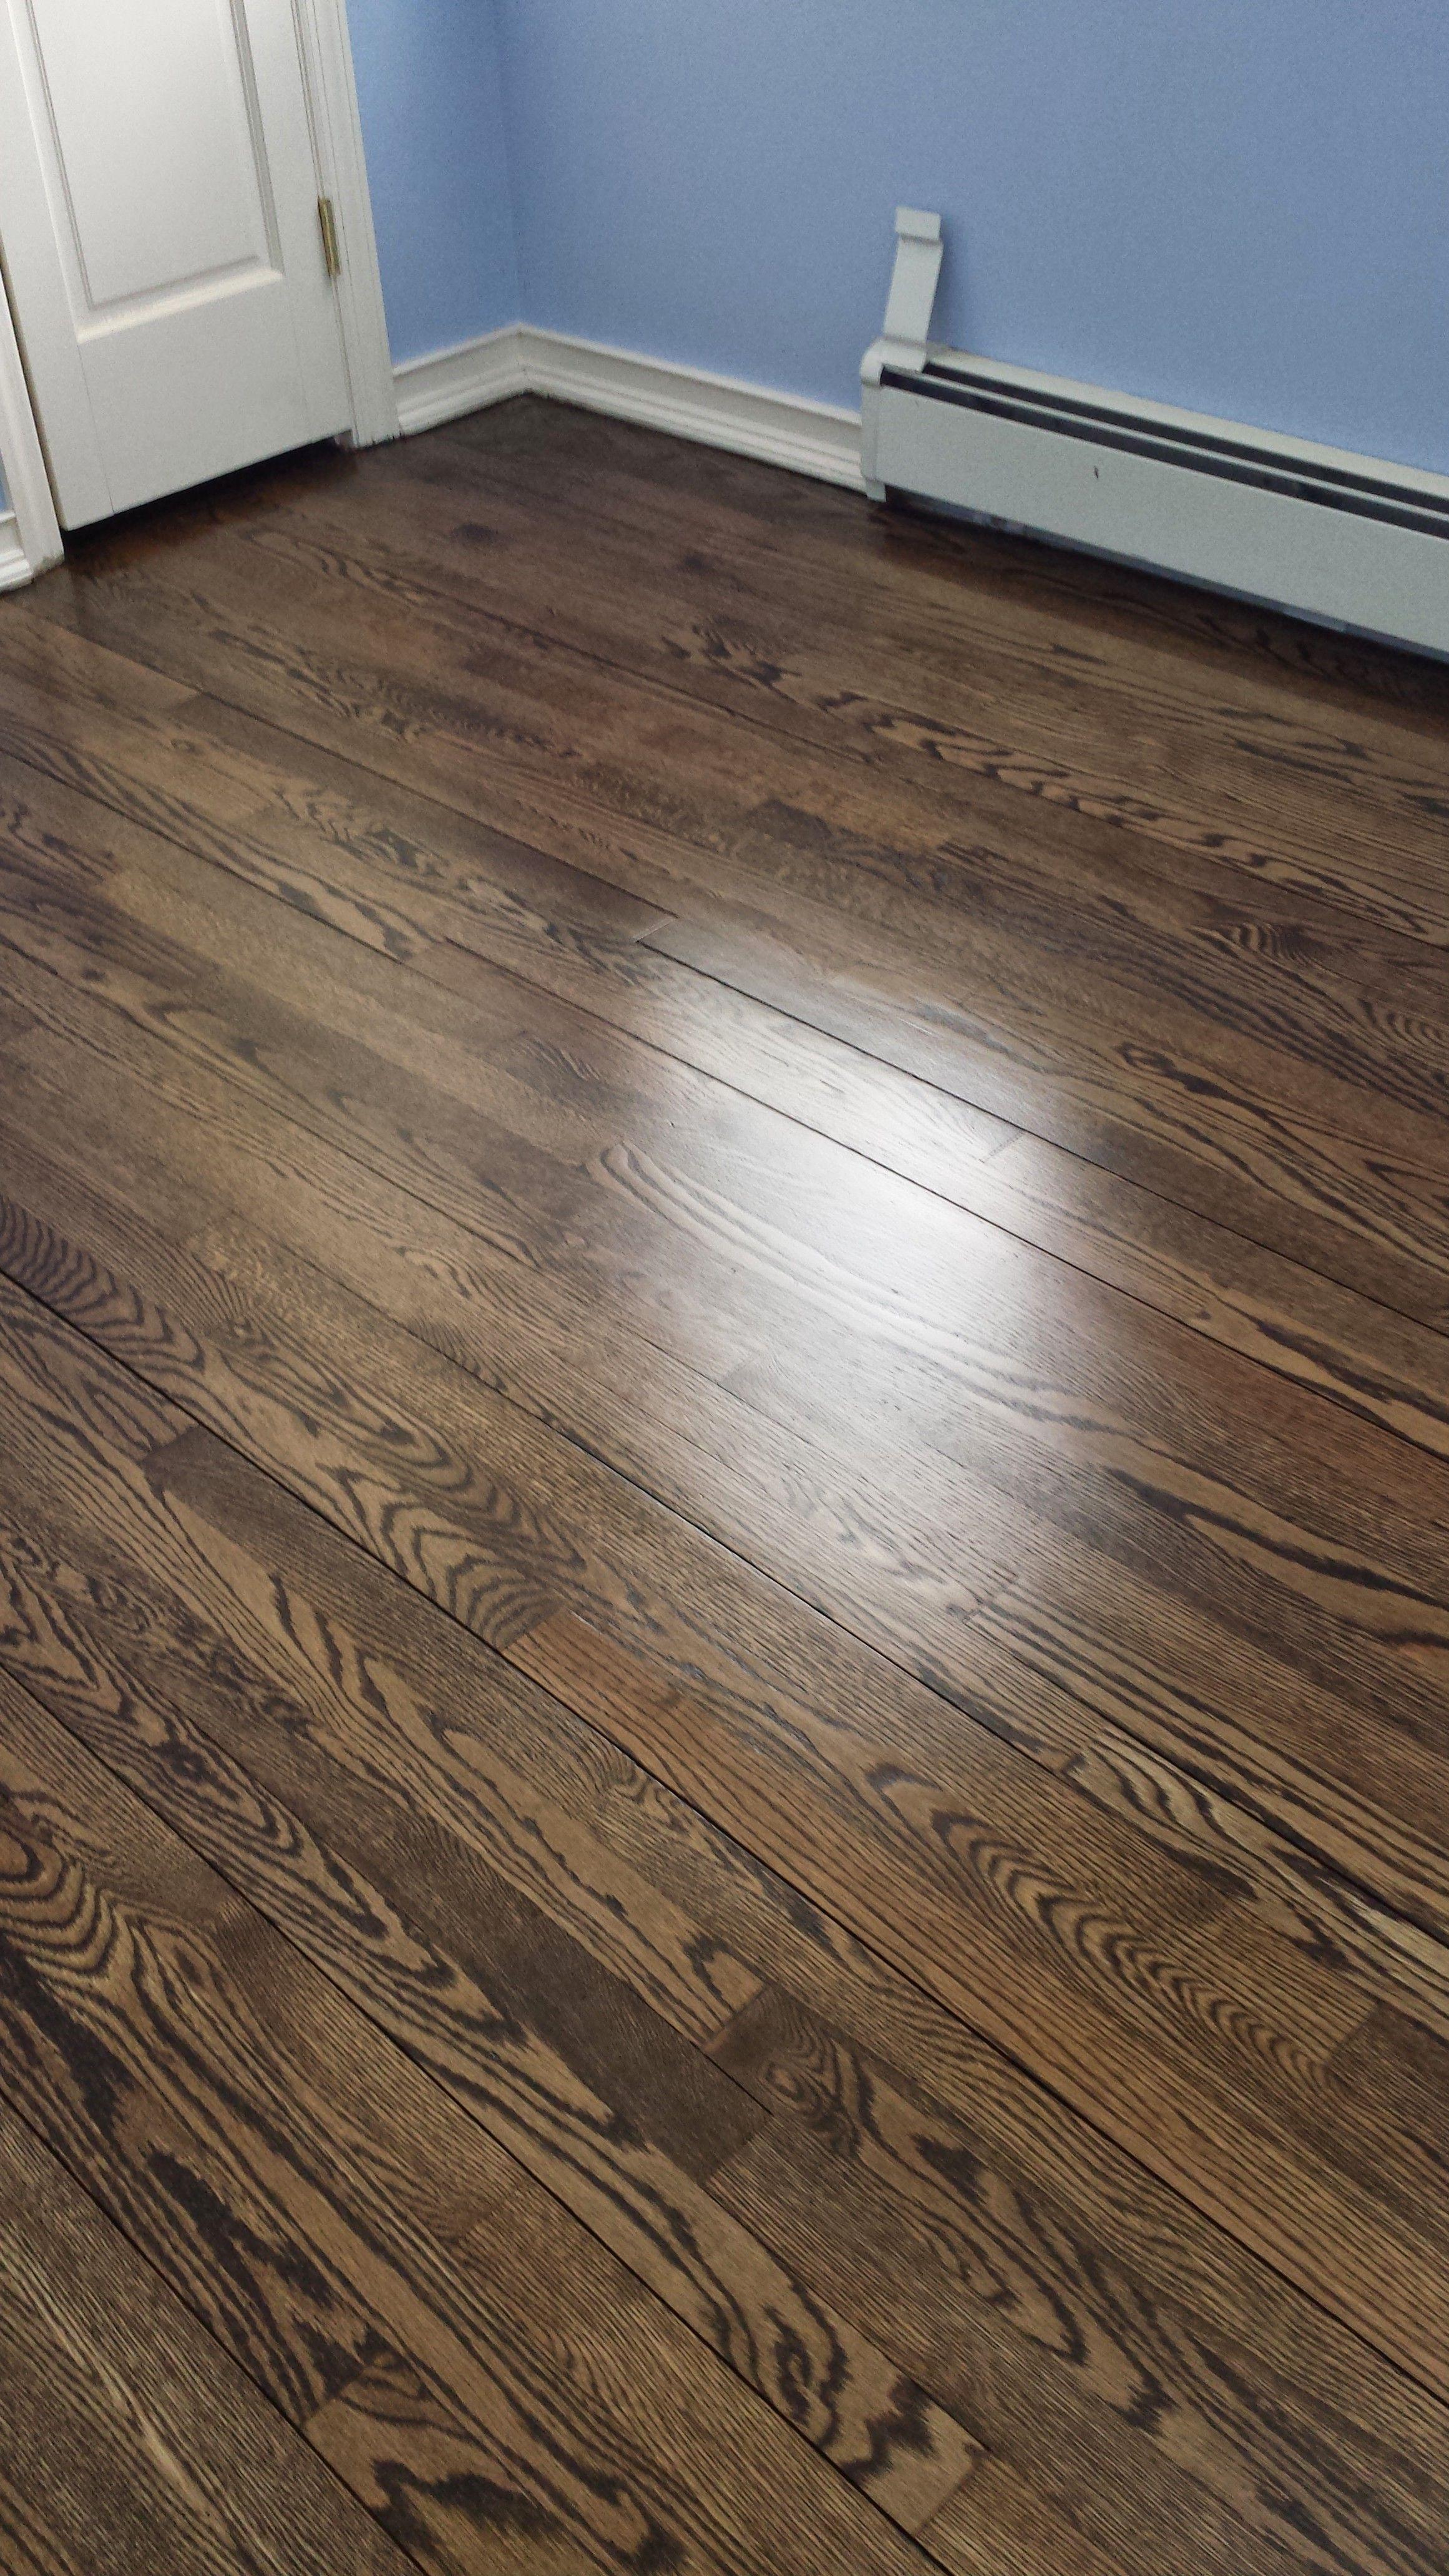 hardwood floor refinishing utica ny of how much to refinish wood floors great methods to use for intended for how much to refinish wood floors great methods to use for refinishing hardwood floors